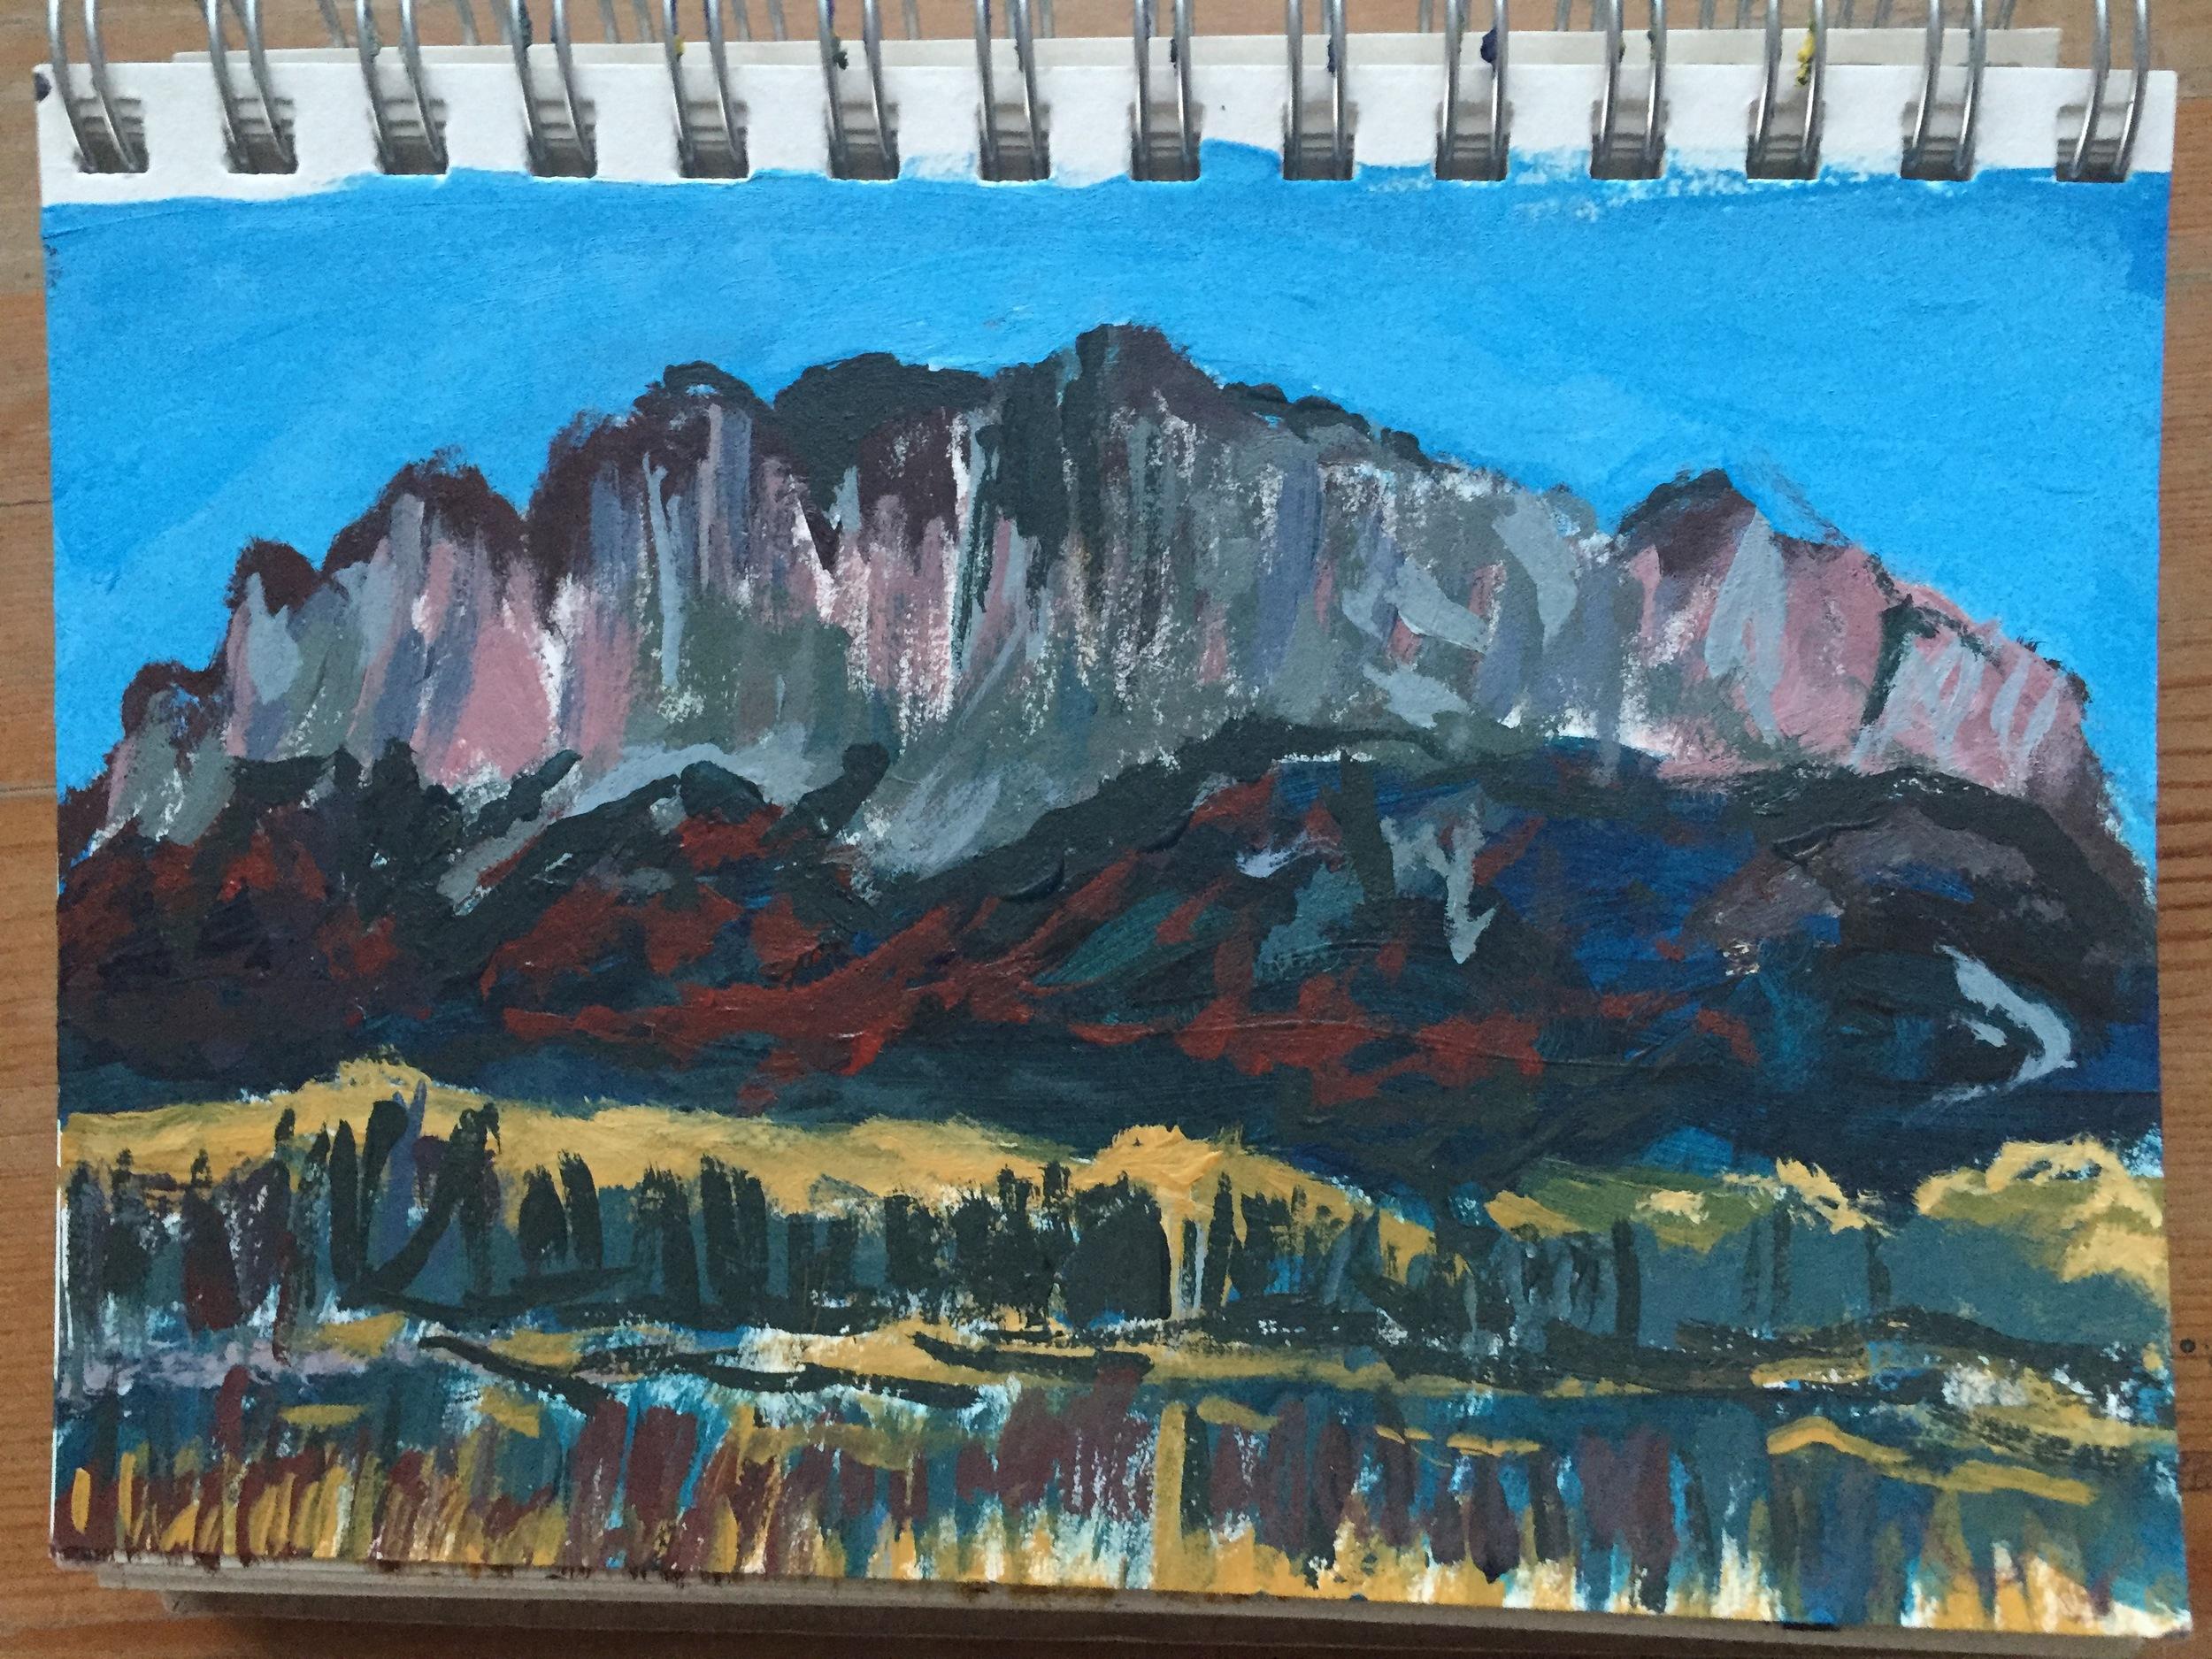 Mr. Yamnuska Sketch. Climb every mountain?